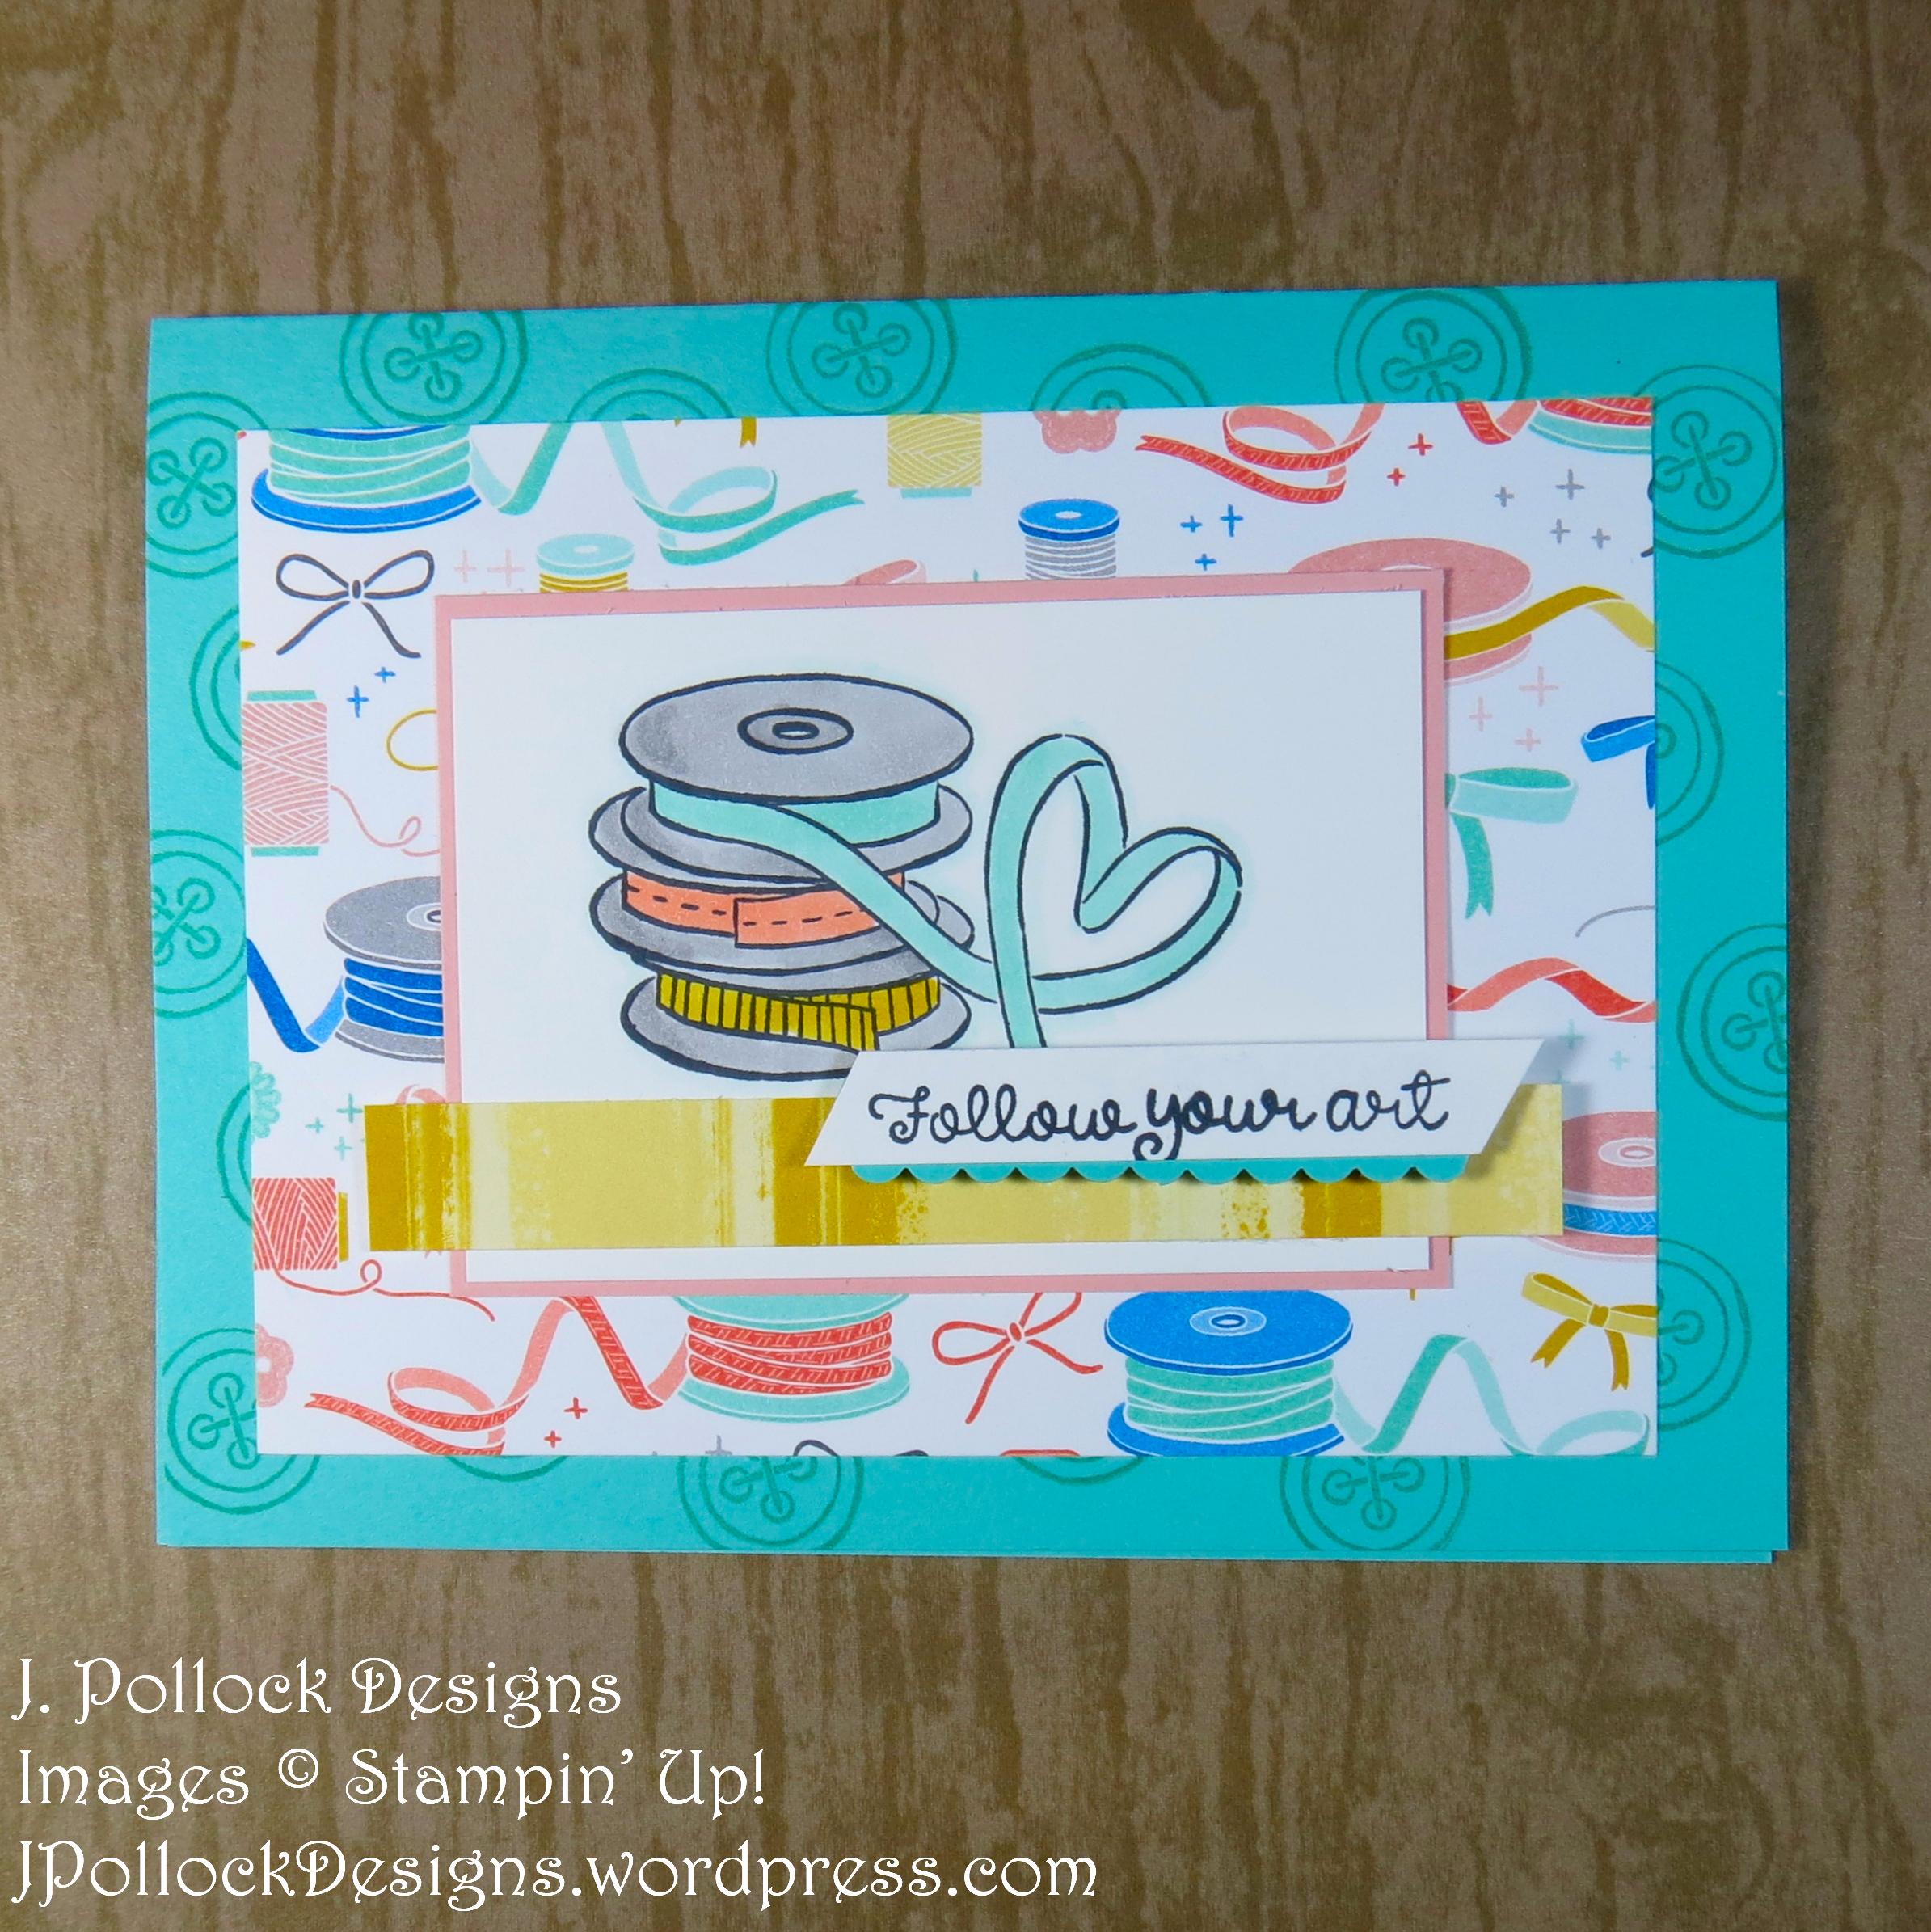 J. Pollock Designs - Stampin' Up! - #MinneapolisOnStage2019